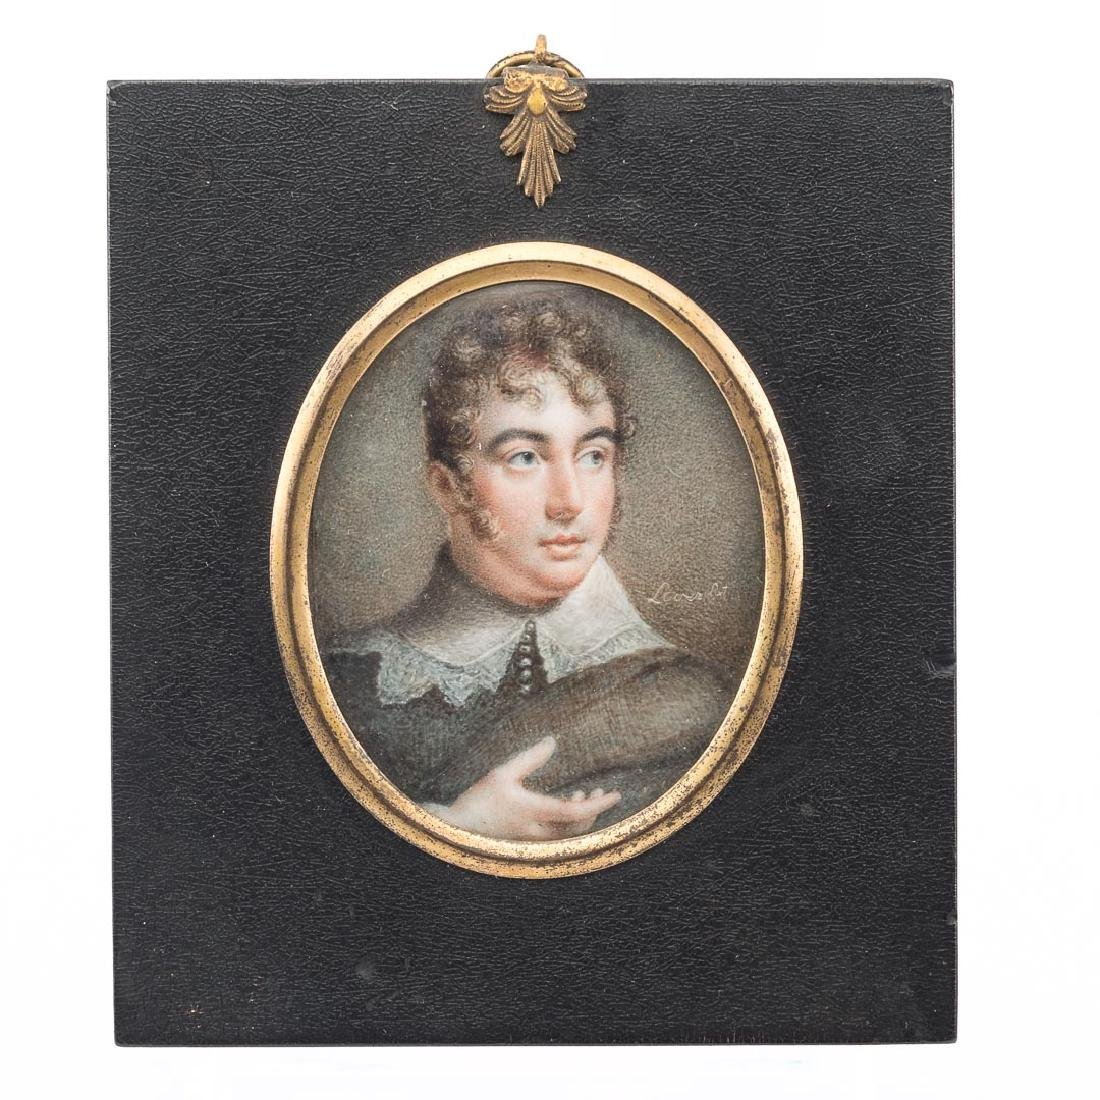 Samuel Lover. Portrait of a Gentleman, miniature